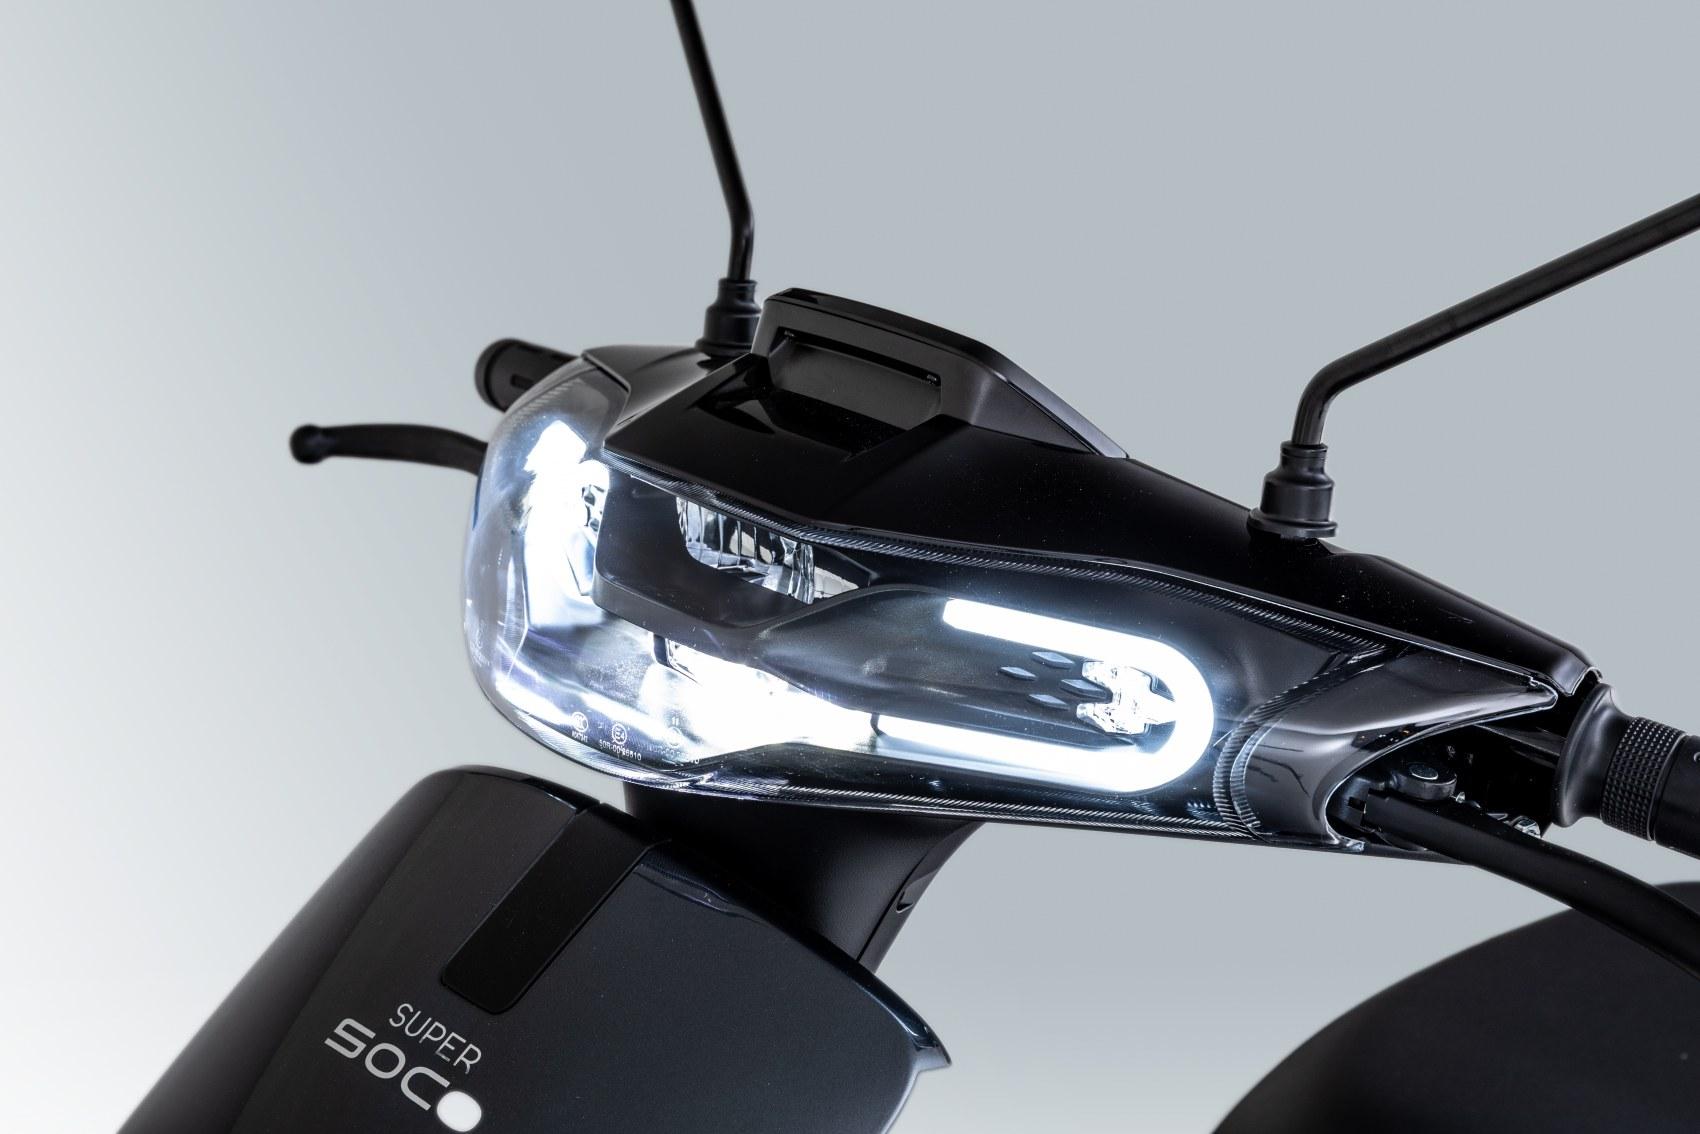 Super Soco CUx electric scooter headlight